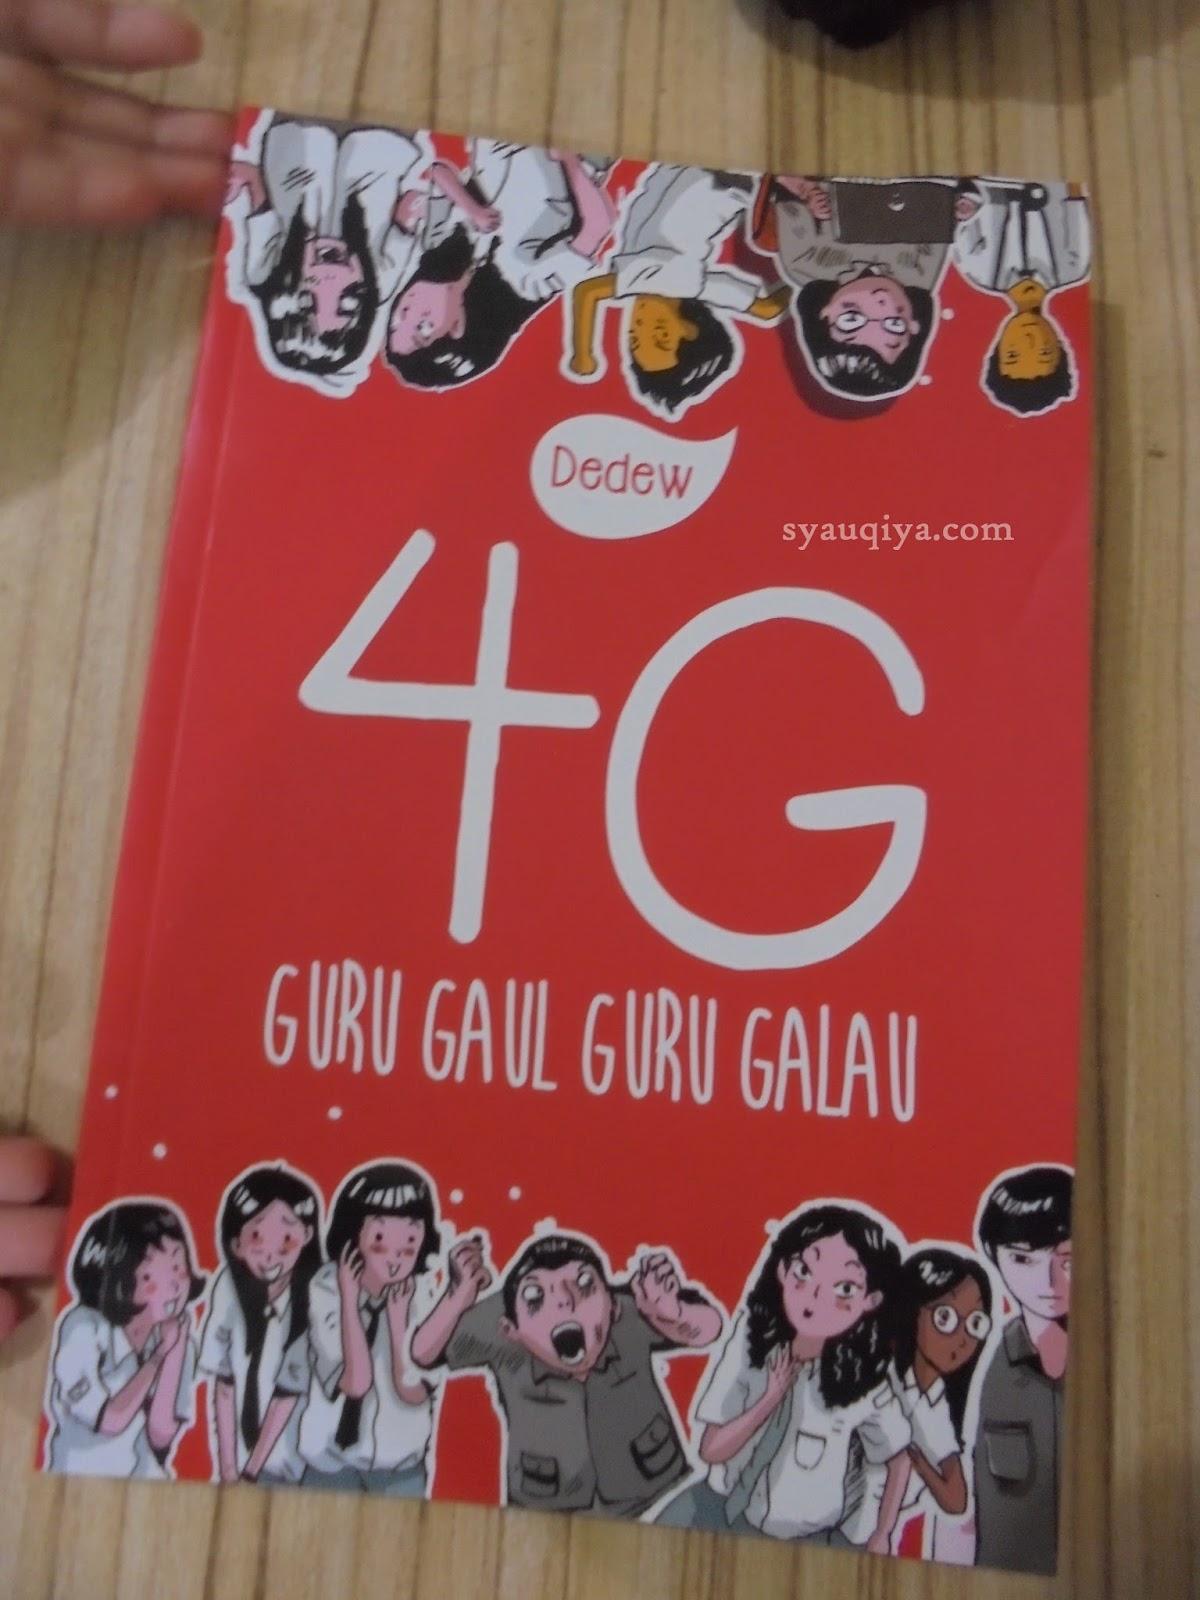 Book Review 4g Guru Gaul Galau Syauqiya Care Buku Judul Penulis Dewi Dedew Rieka Editor D Kurniawan Desain Sampul Dan Isi Candea Analinta Penata Letak Diyantomo